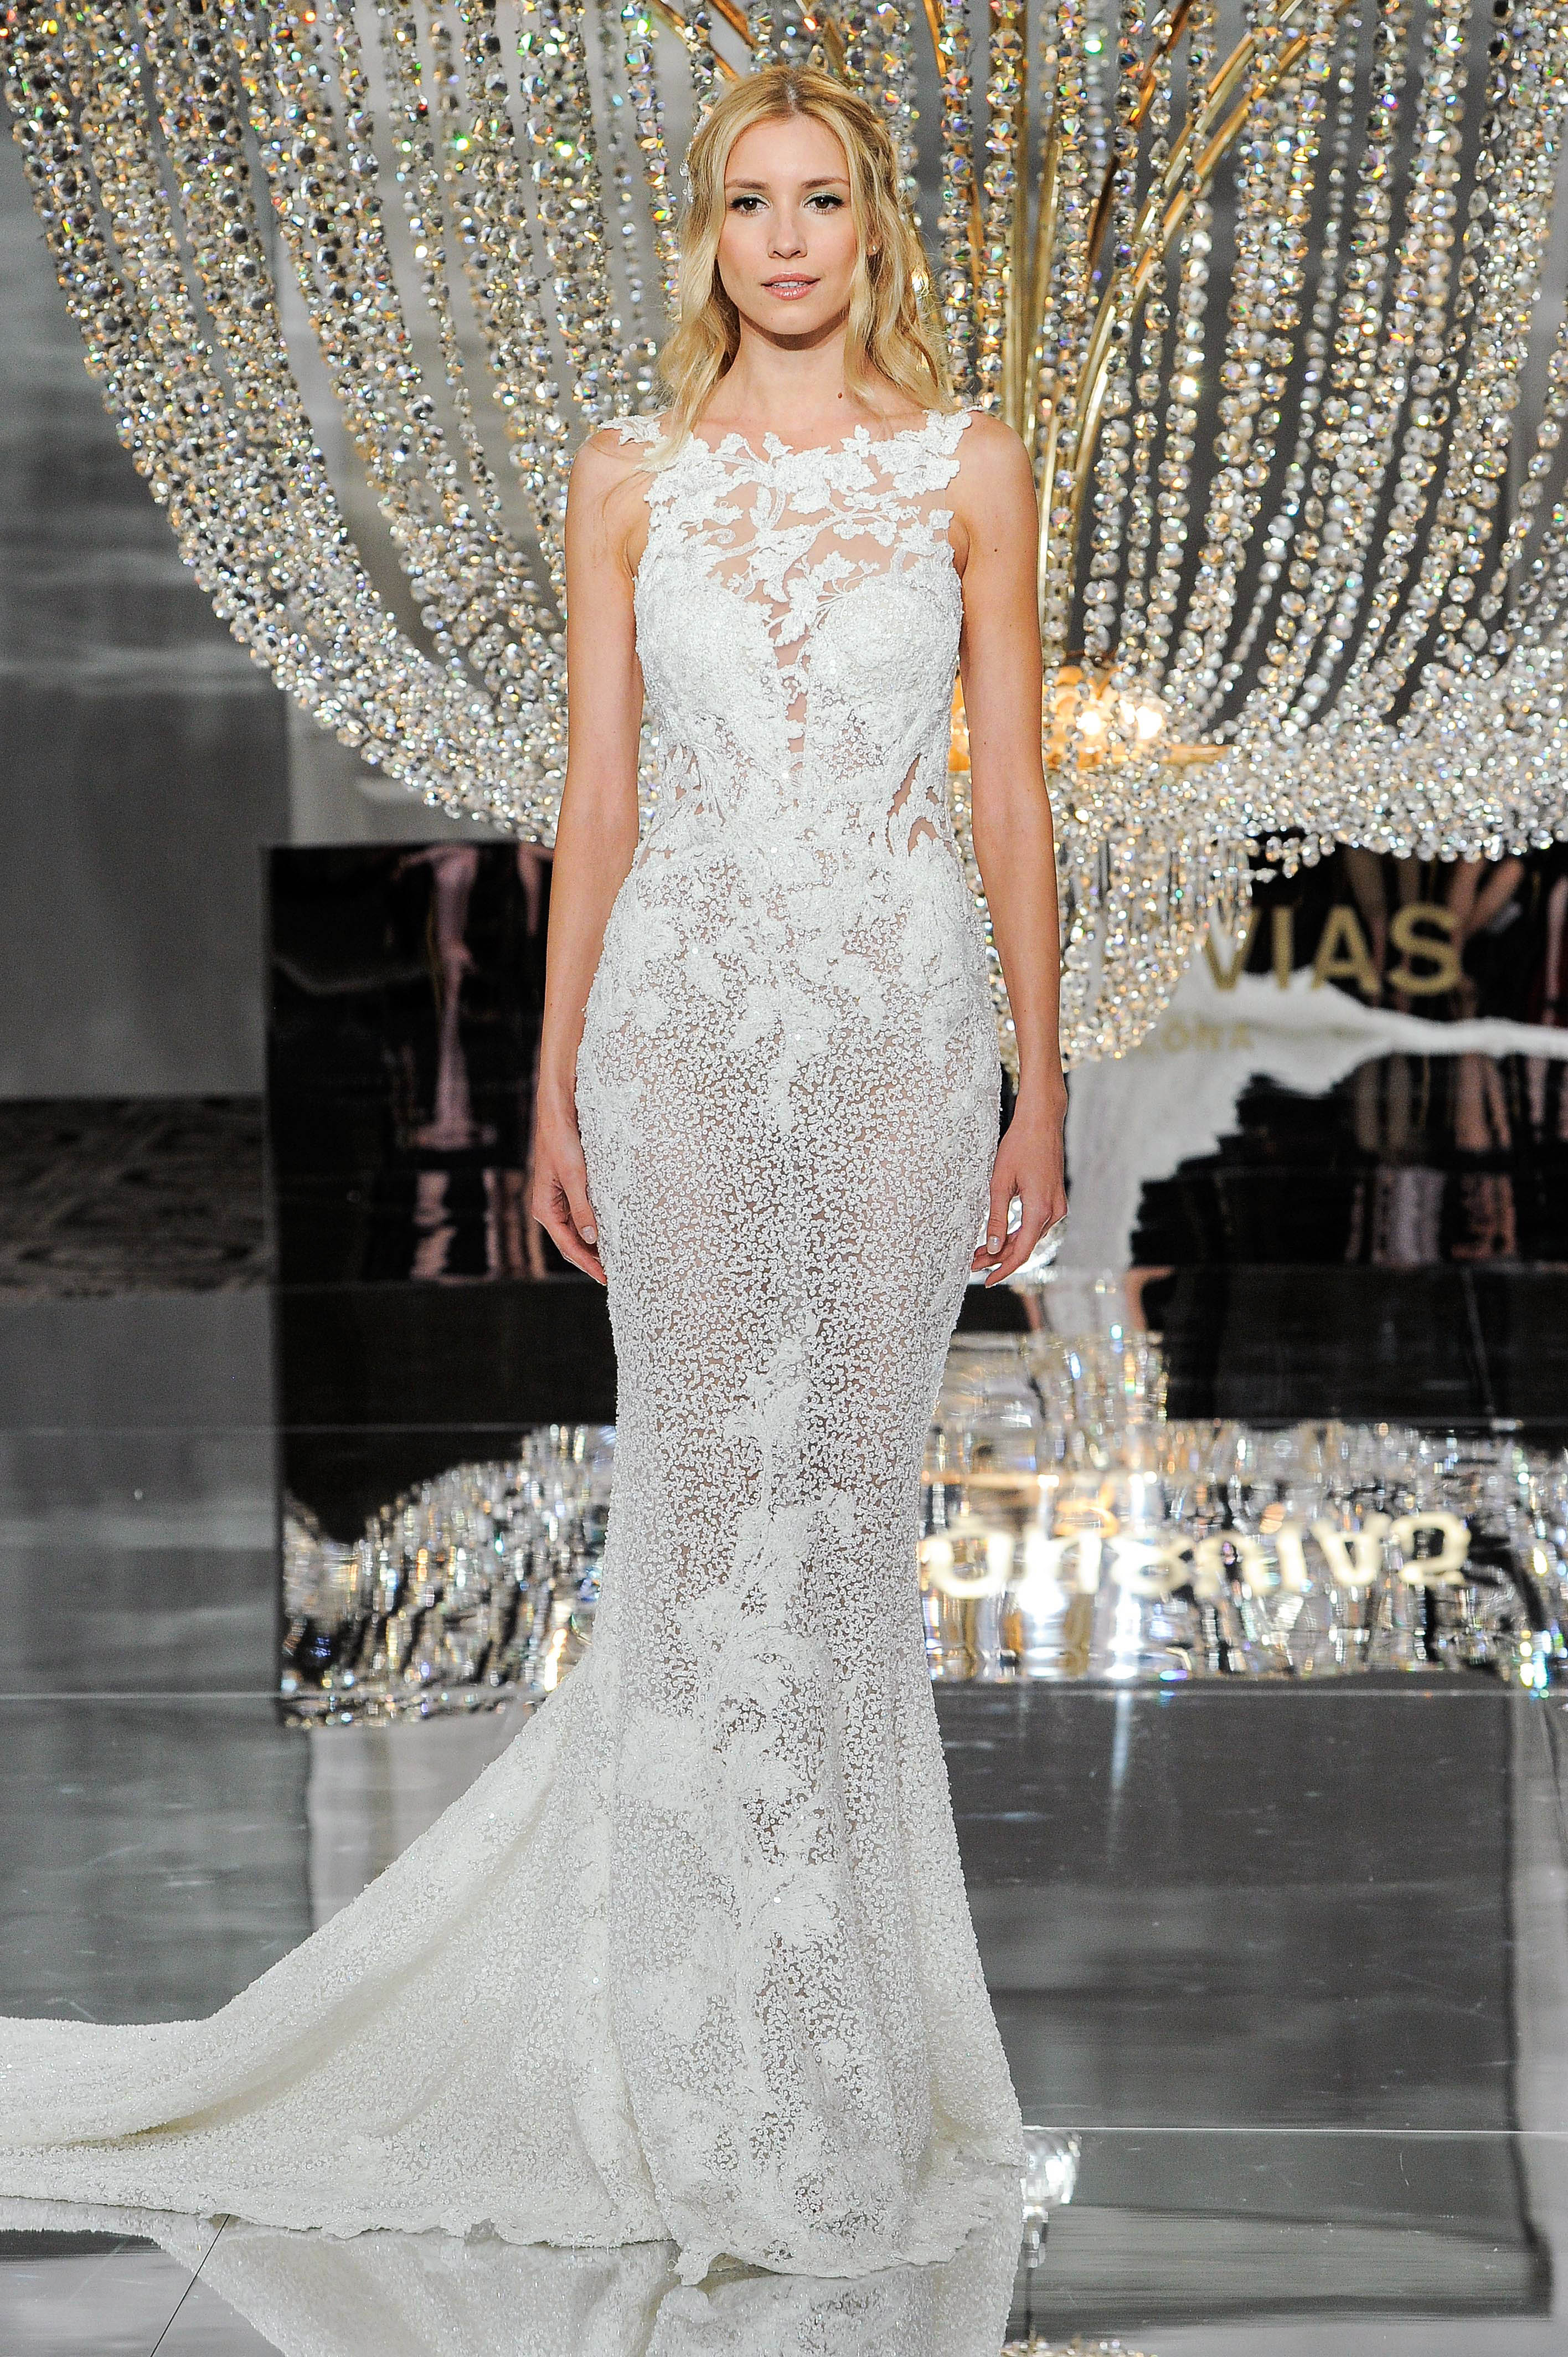 pronovias wedding dress fall 2018 strapless lace trumpet